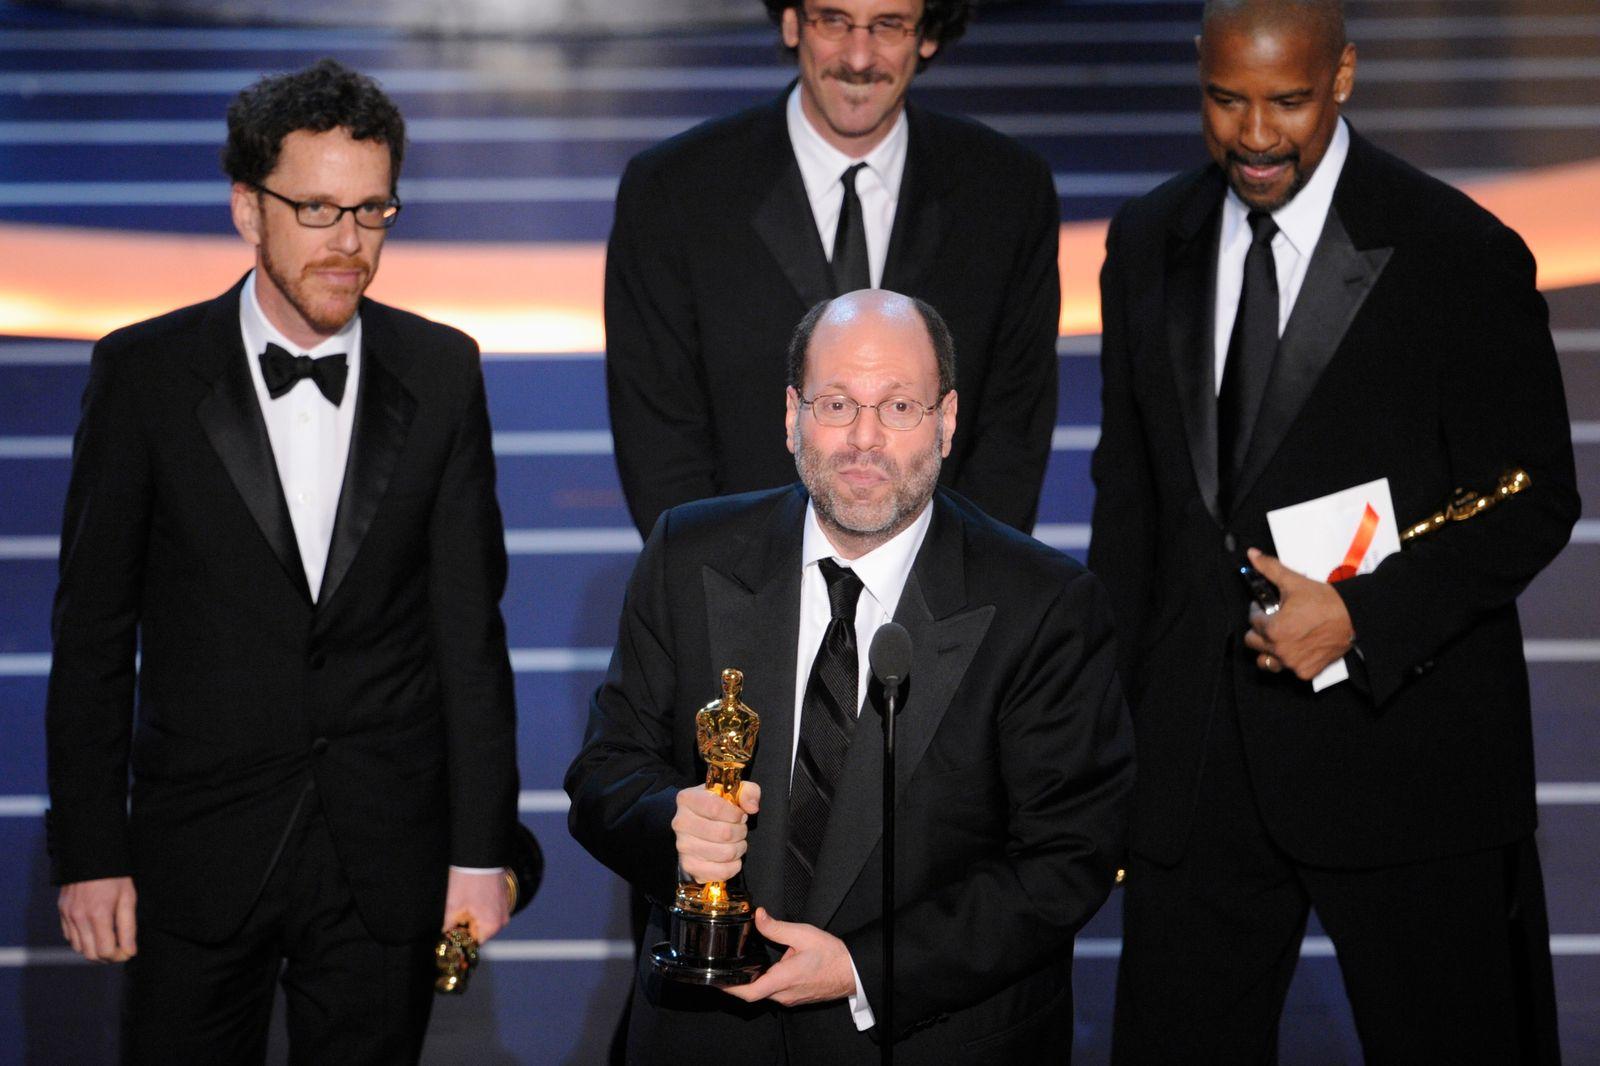 Scott Rudin, Ethan Coen and Joel Coen, Denzel Washington